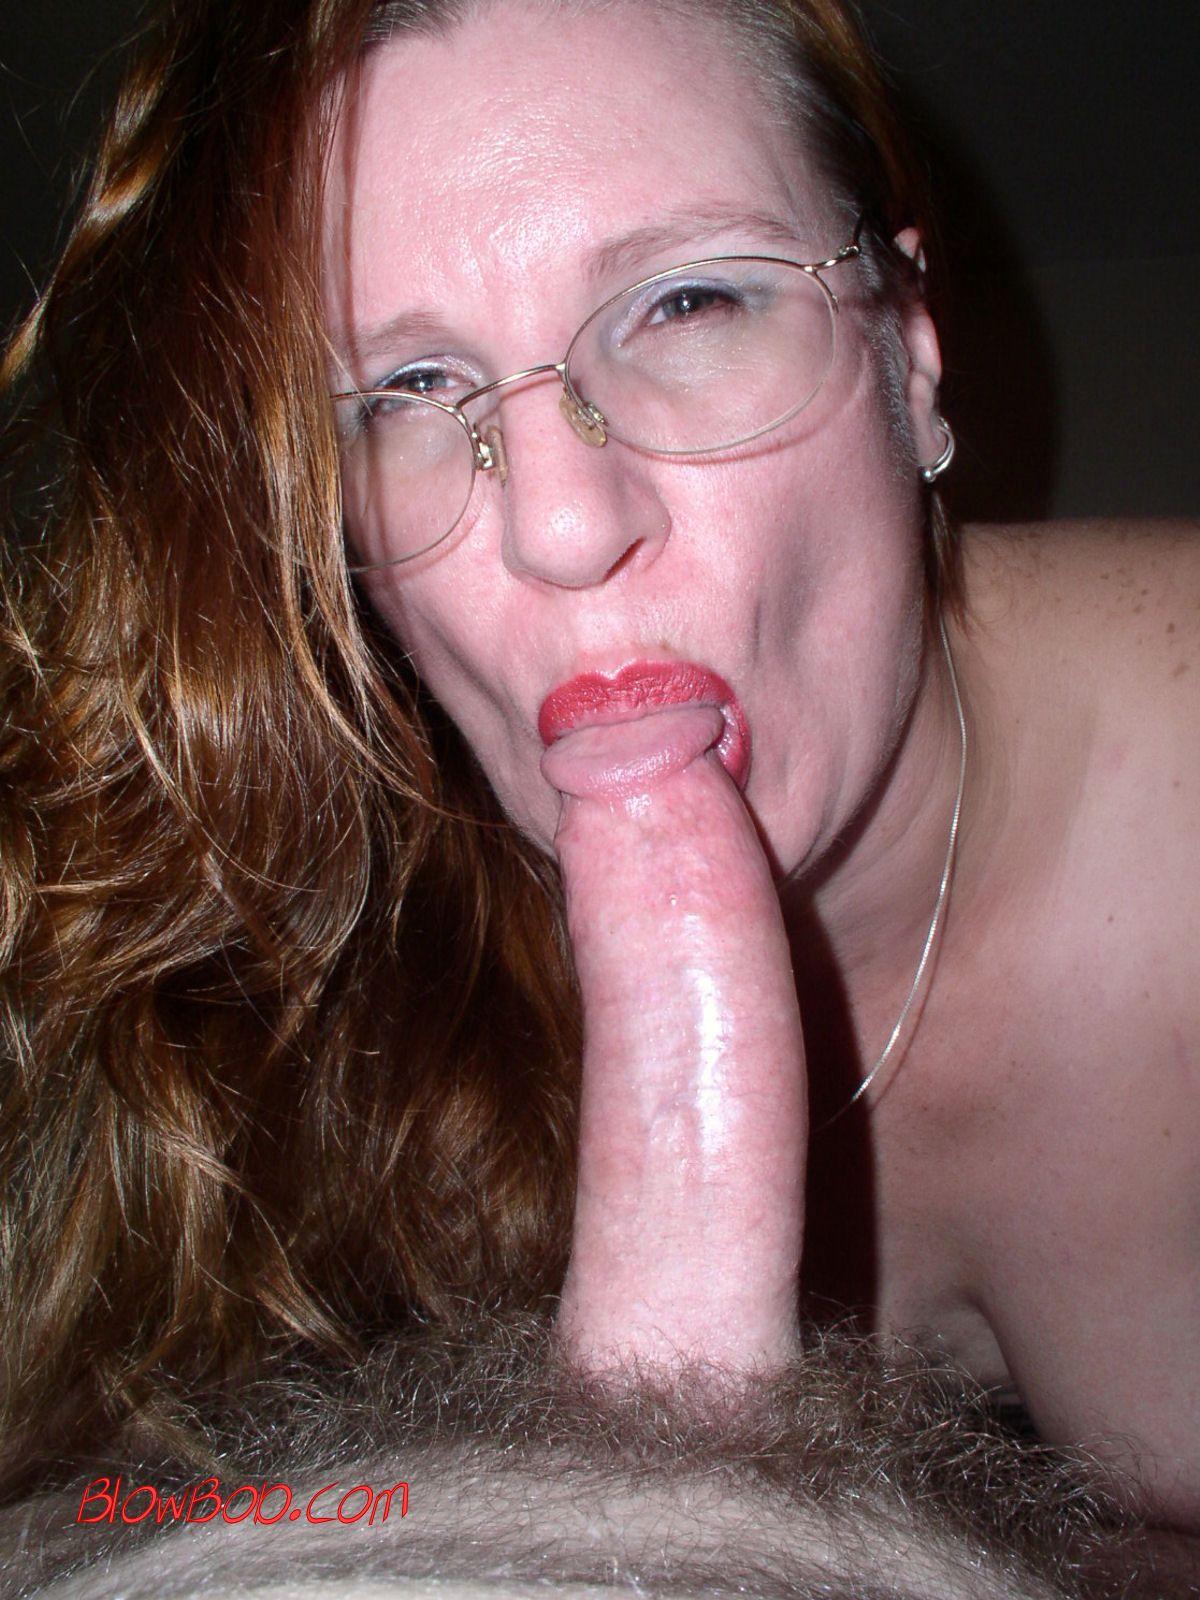 Sexy blowjob lips